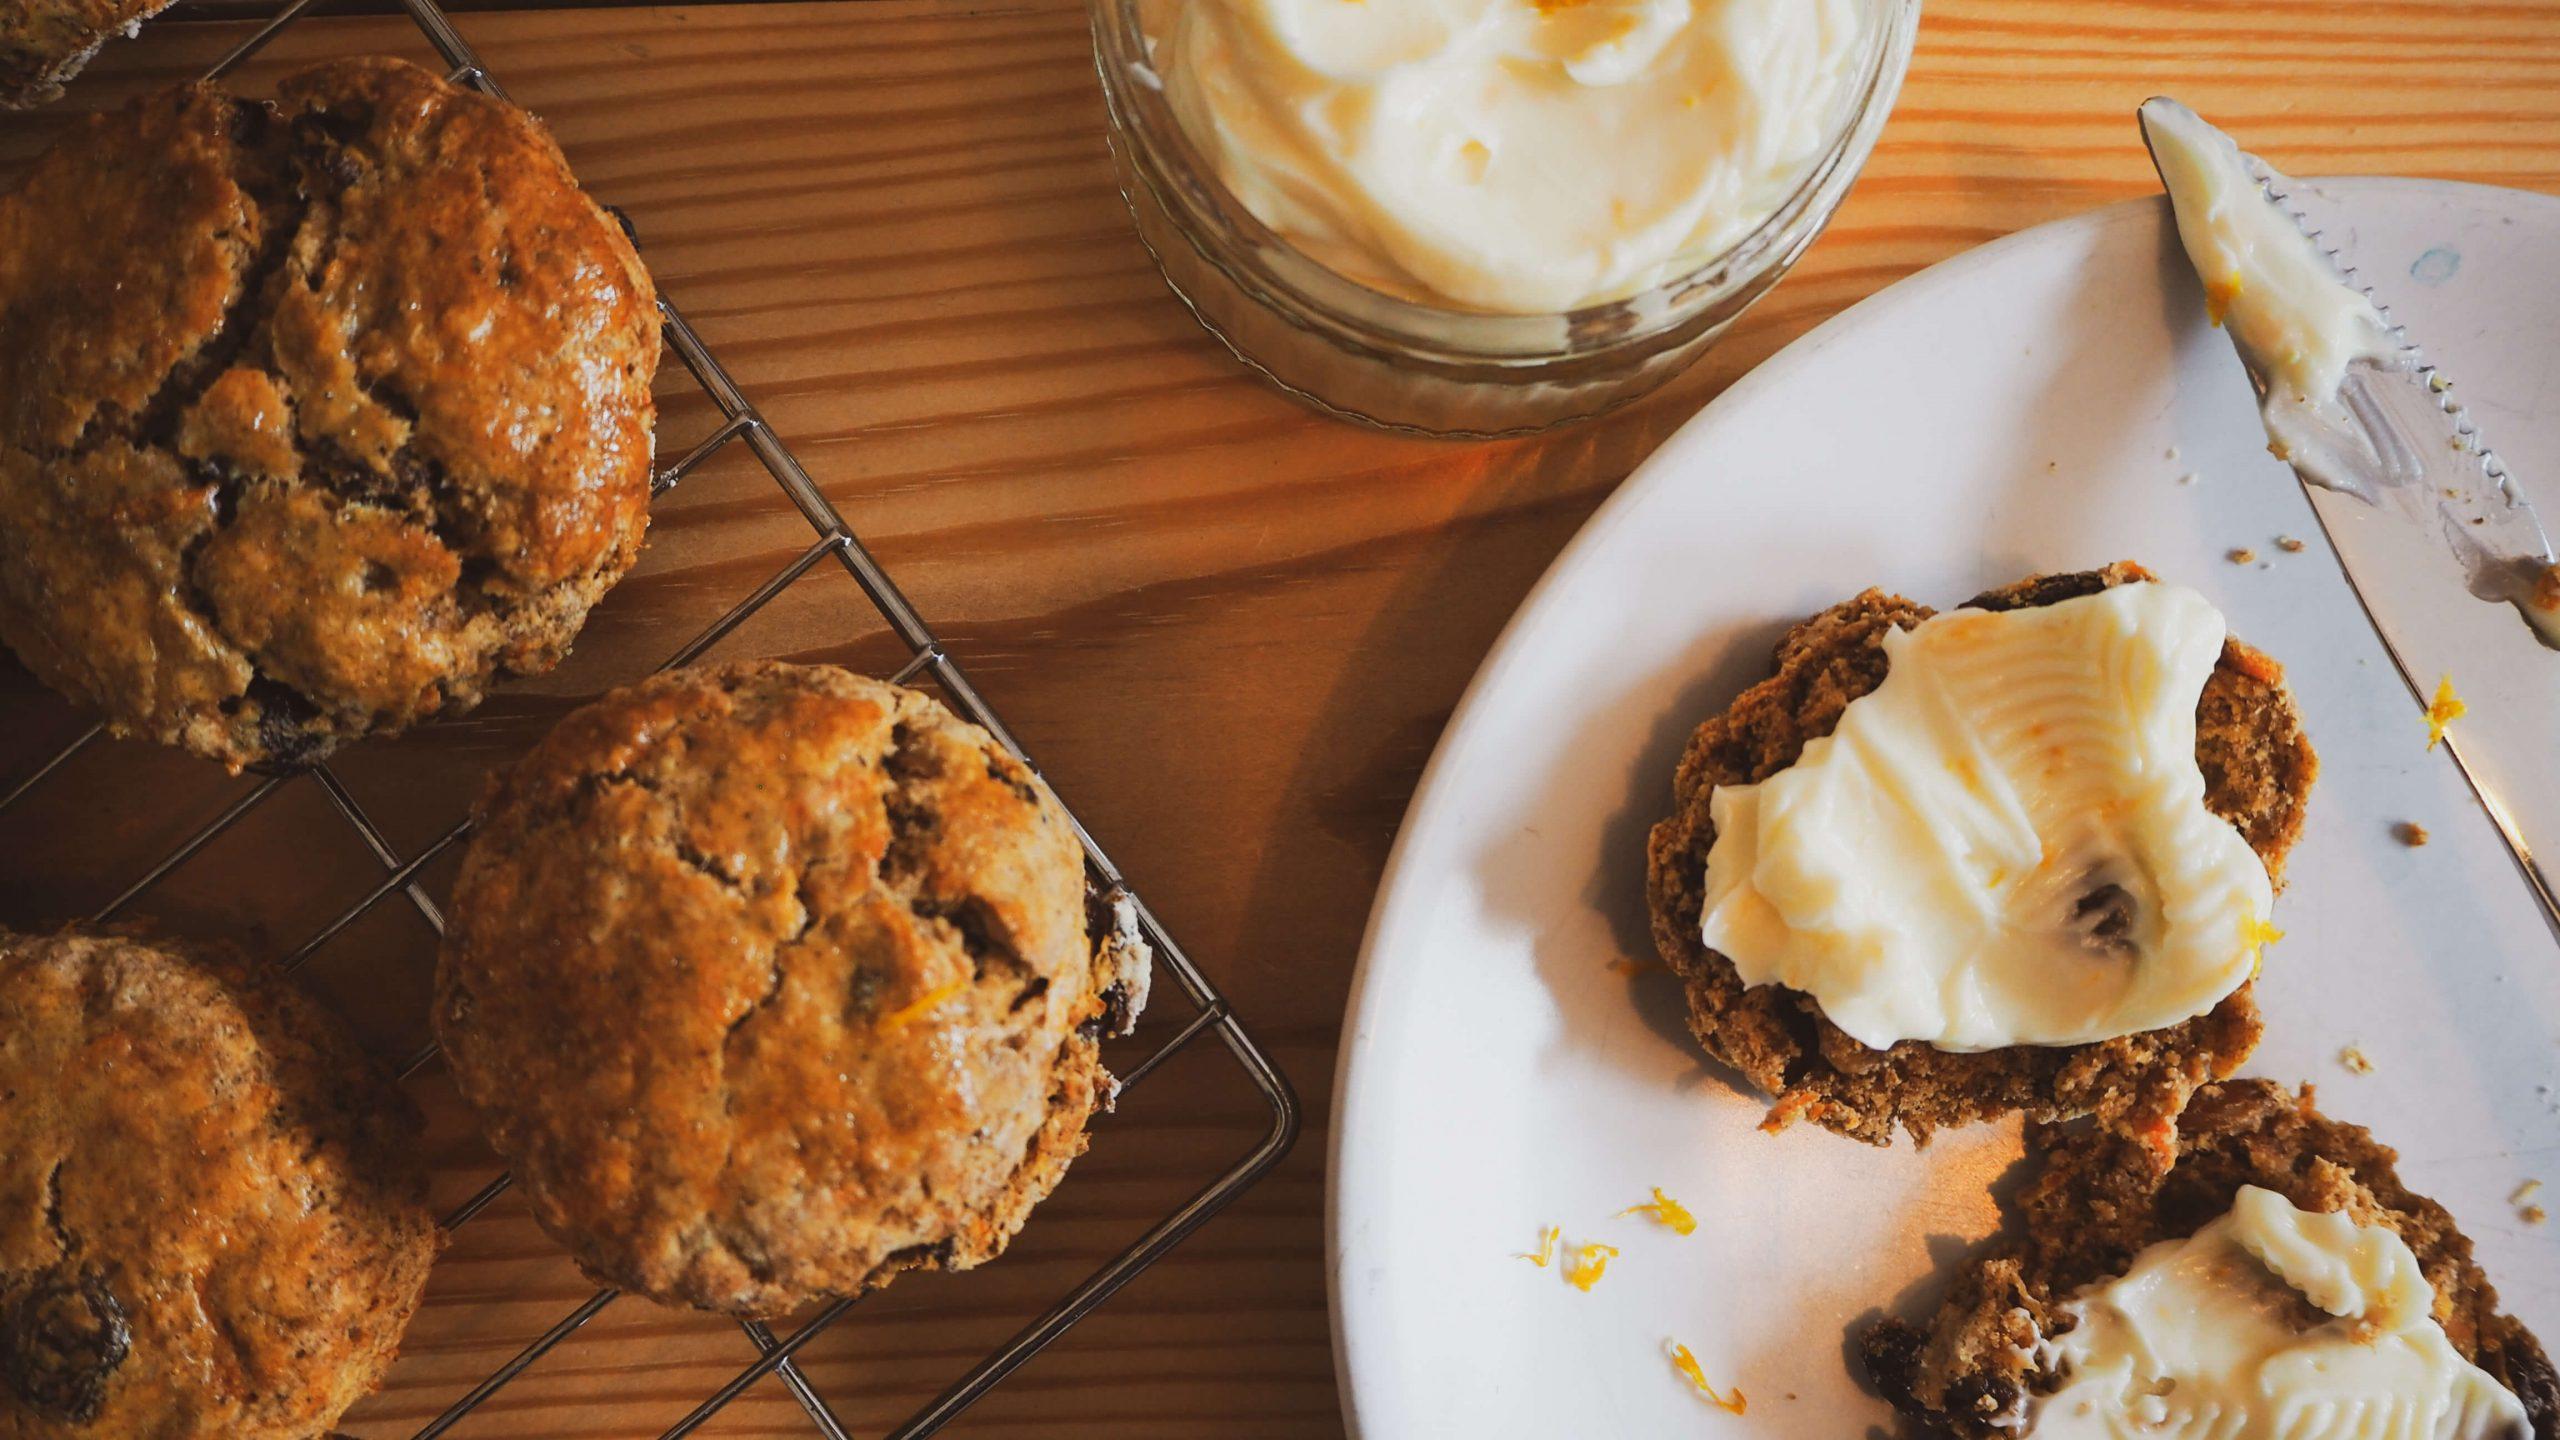 Belly Bakes Week 21: Carrot cake scone recipe